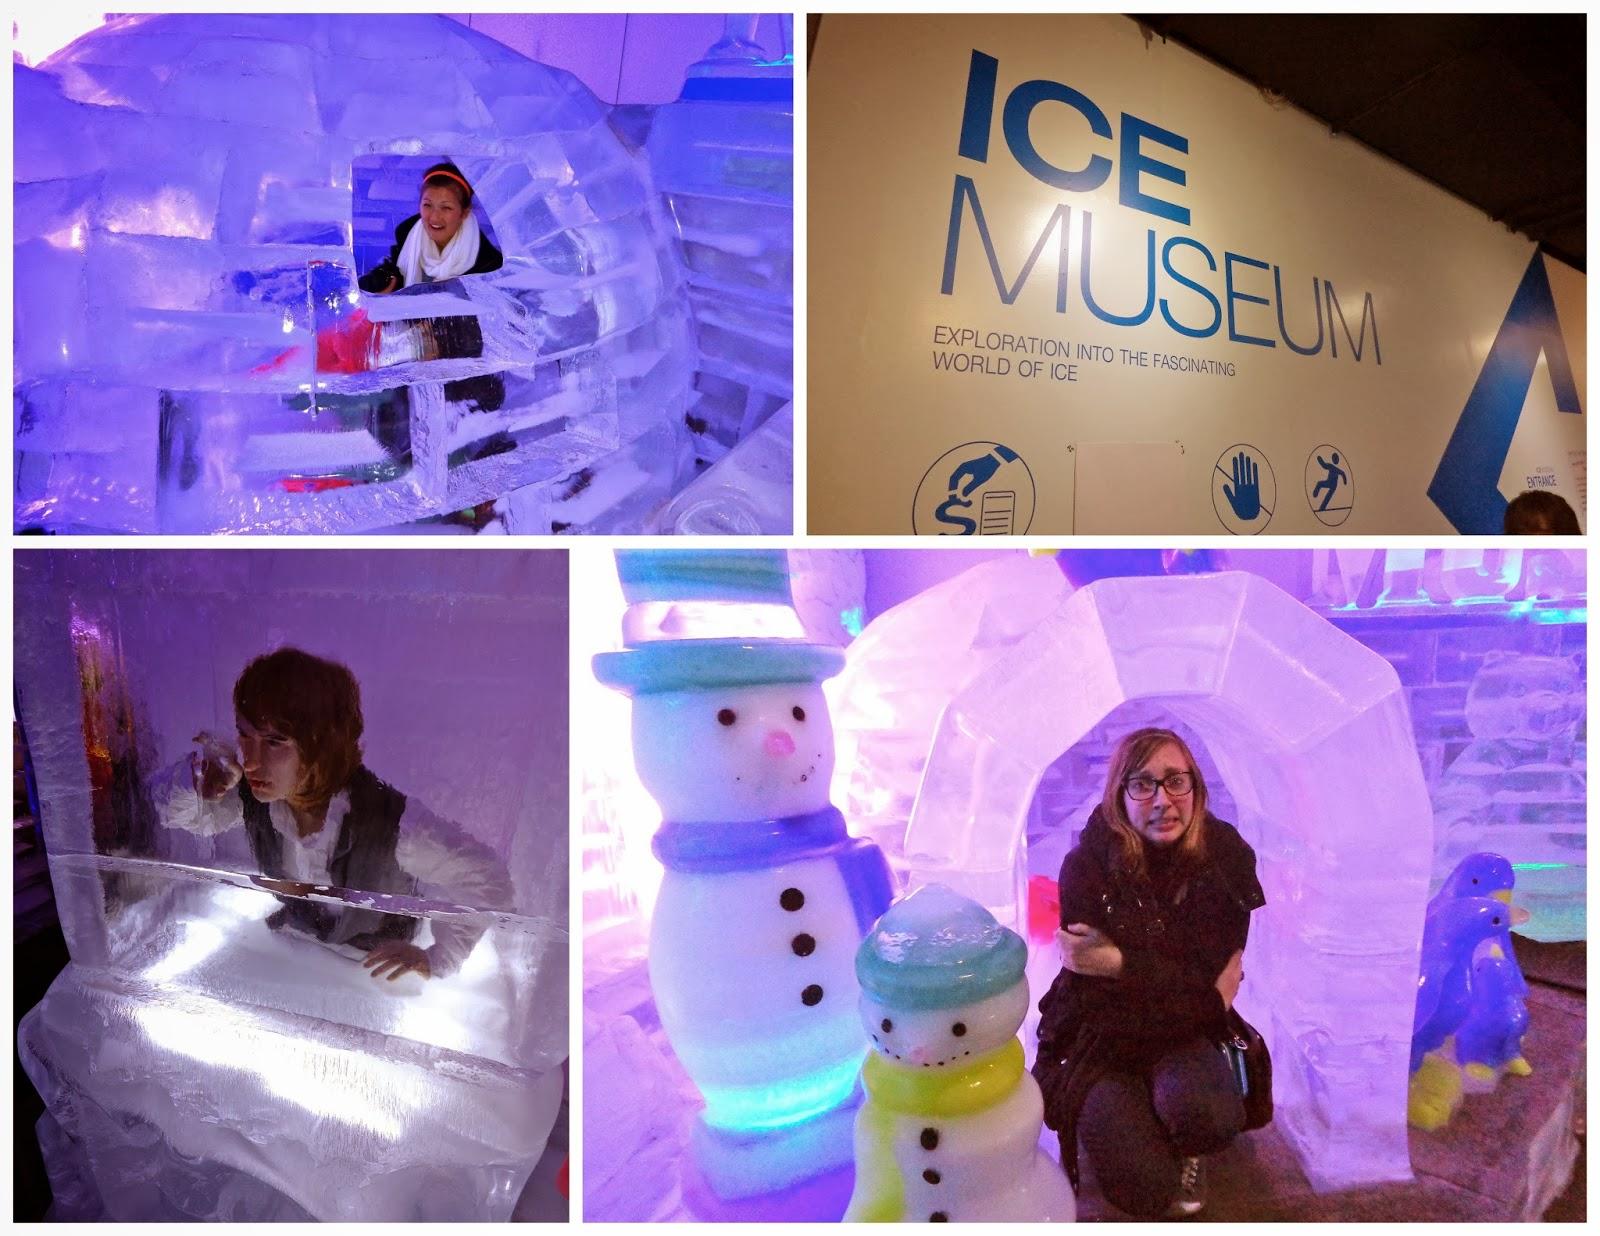 Ice museum Seoul